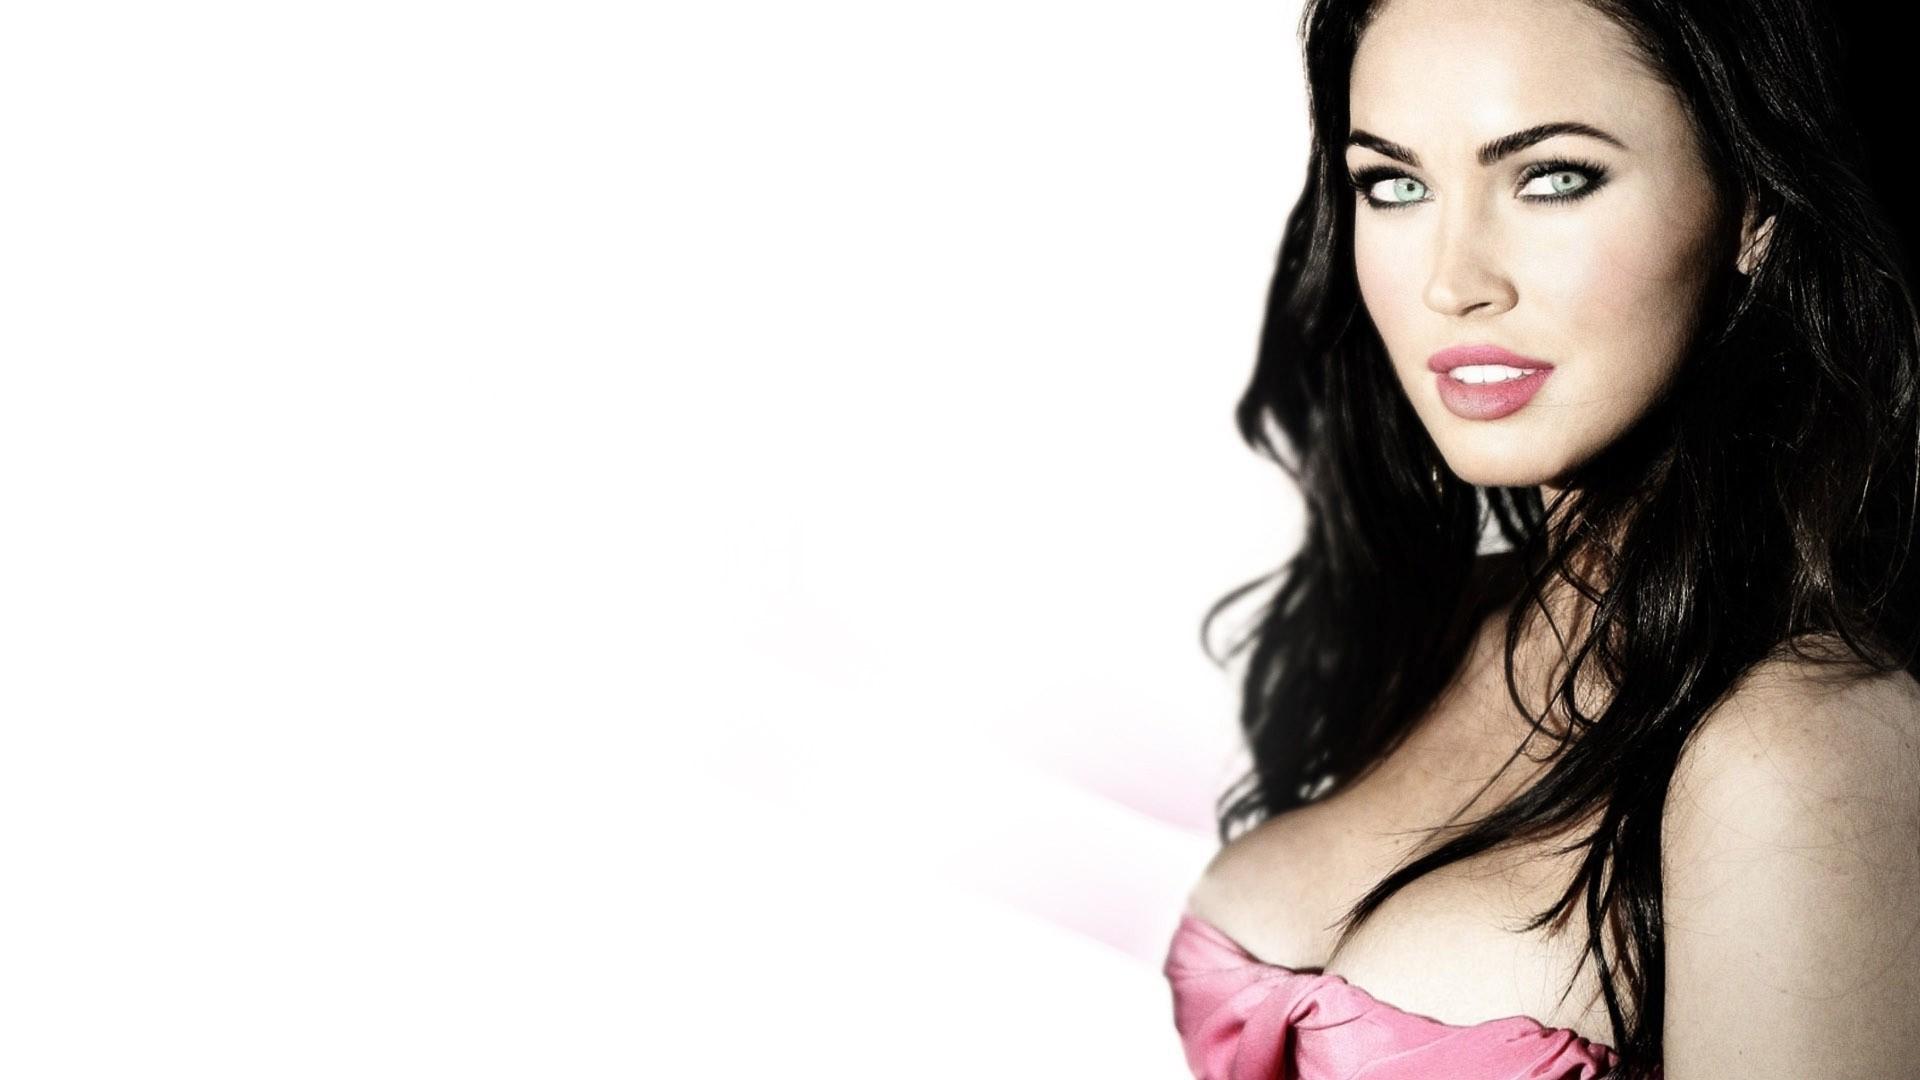 Megan Fox Pictures